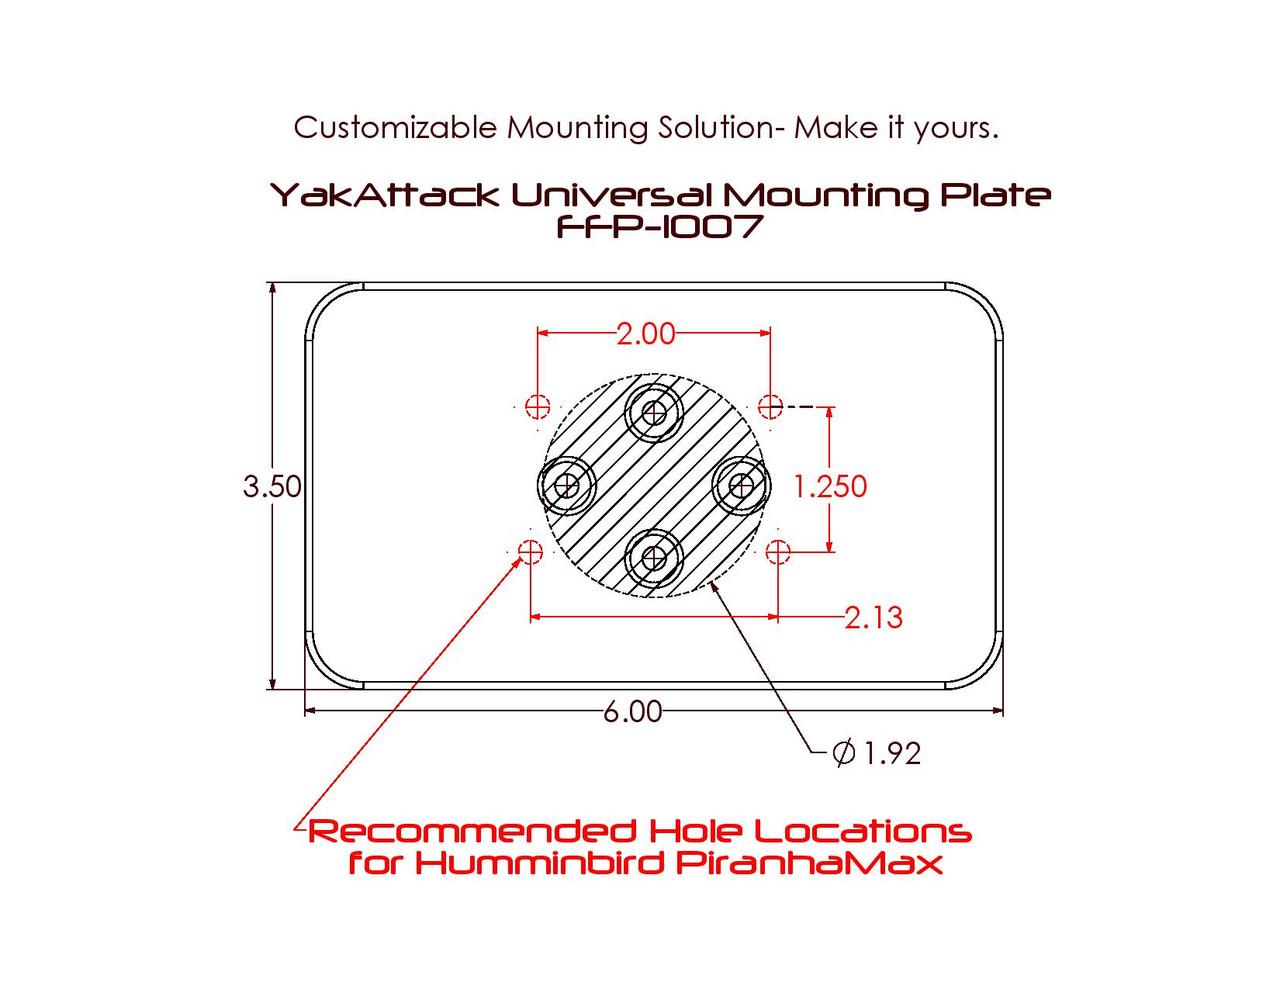 Universal Mounting Plate (FFP-1007)